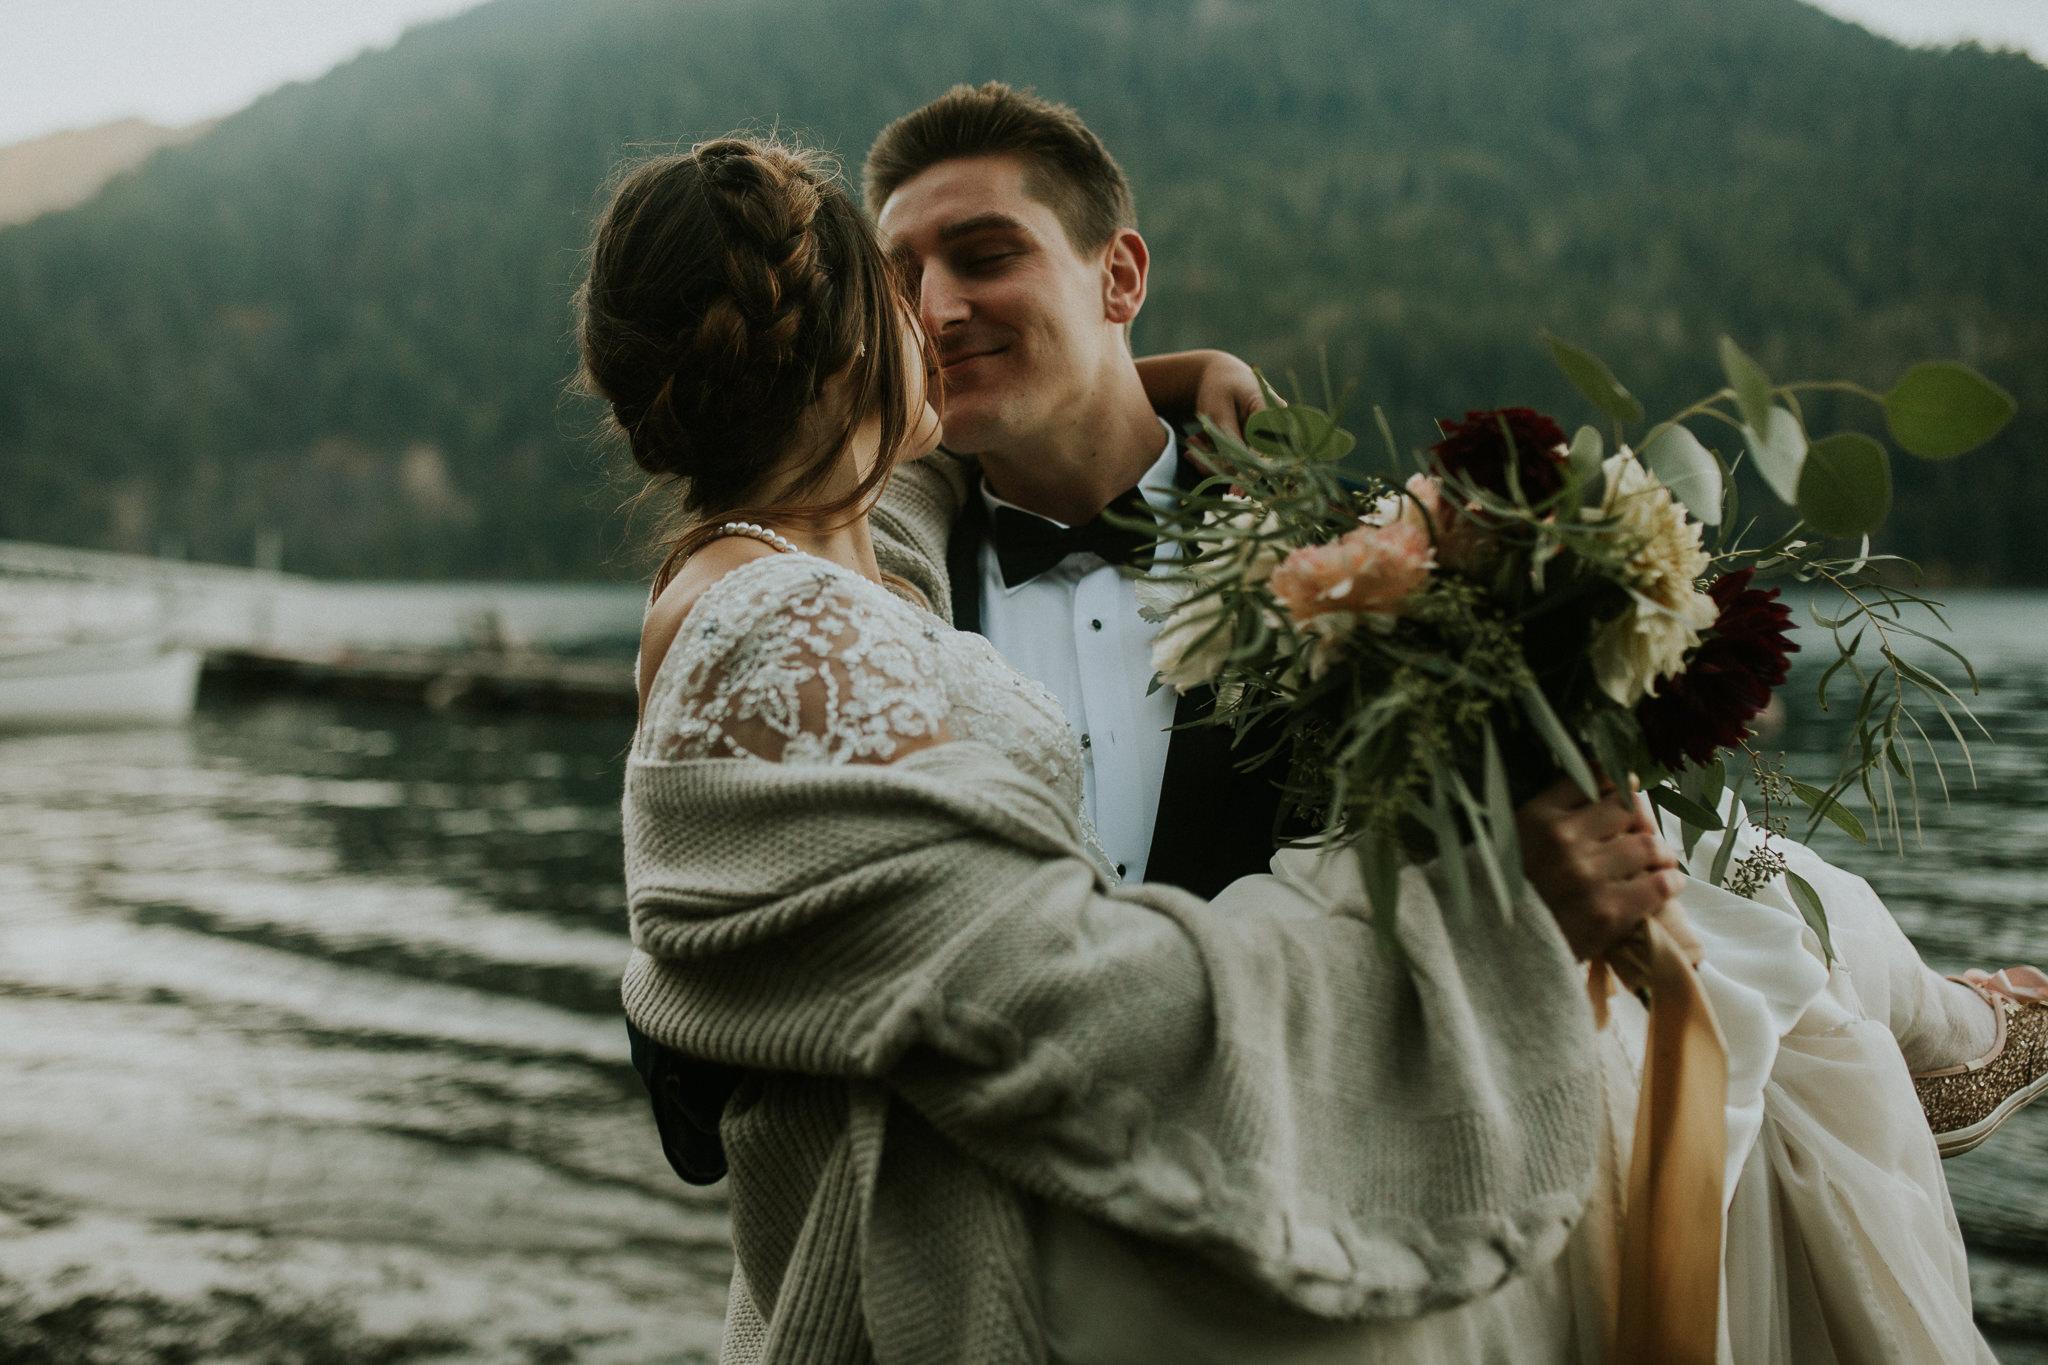 Cresent-lake-elopement-BreeAnna-Lasher-53.jpg